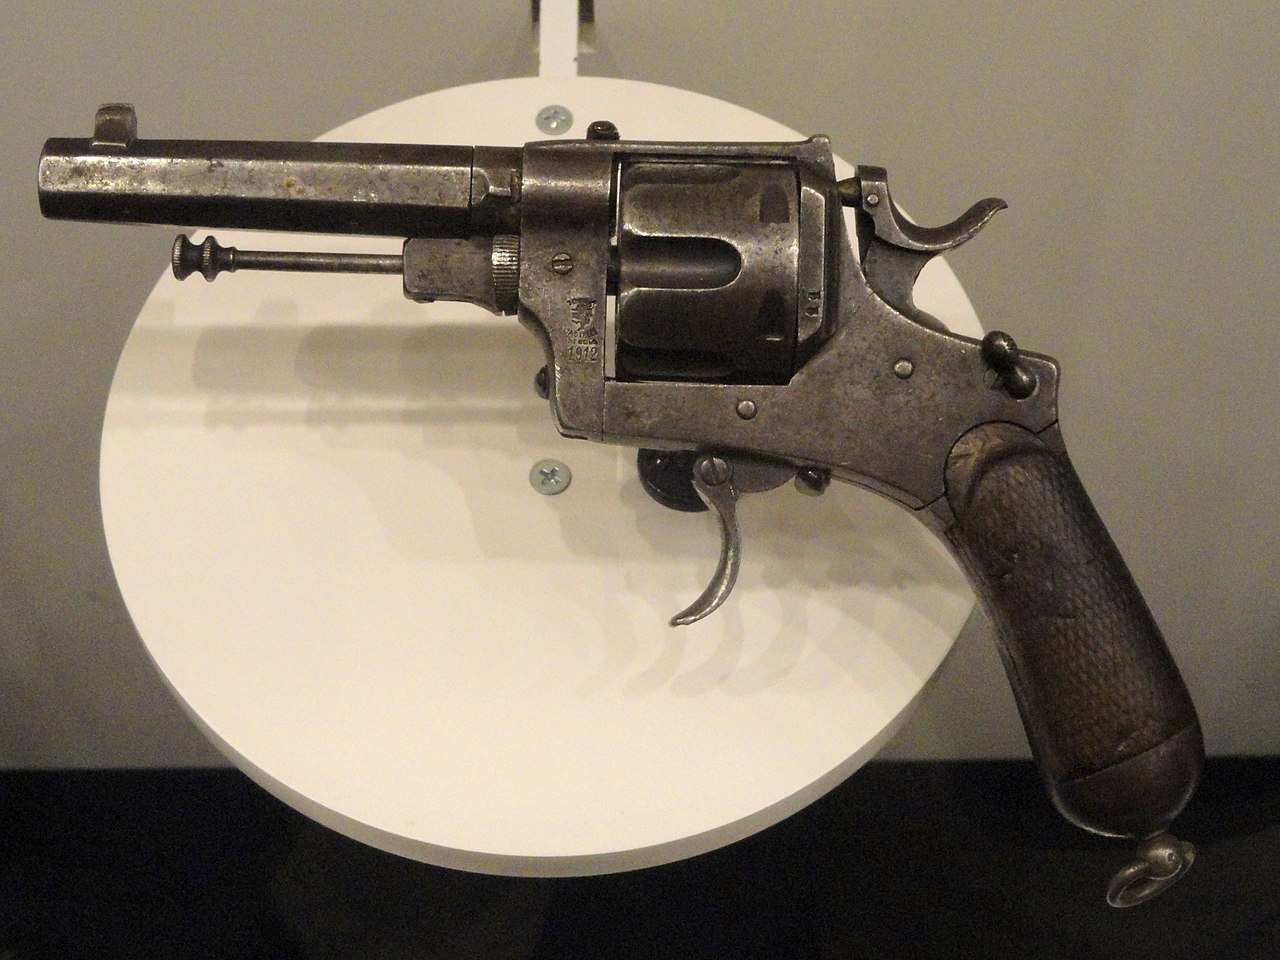 Italy revolver, Modello 1889, Pistola a Rotazione, System Bodeo, Caliber 10.35 mm, made in 1918 - National World War I Museum - Kansas City, MO - DSC07468.JPG